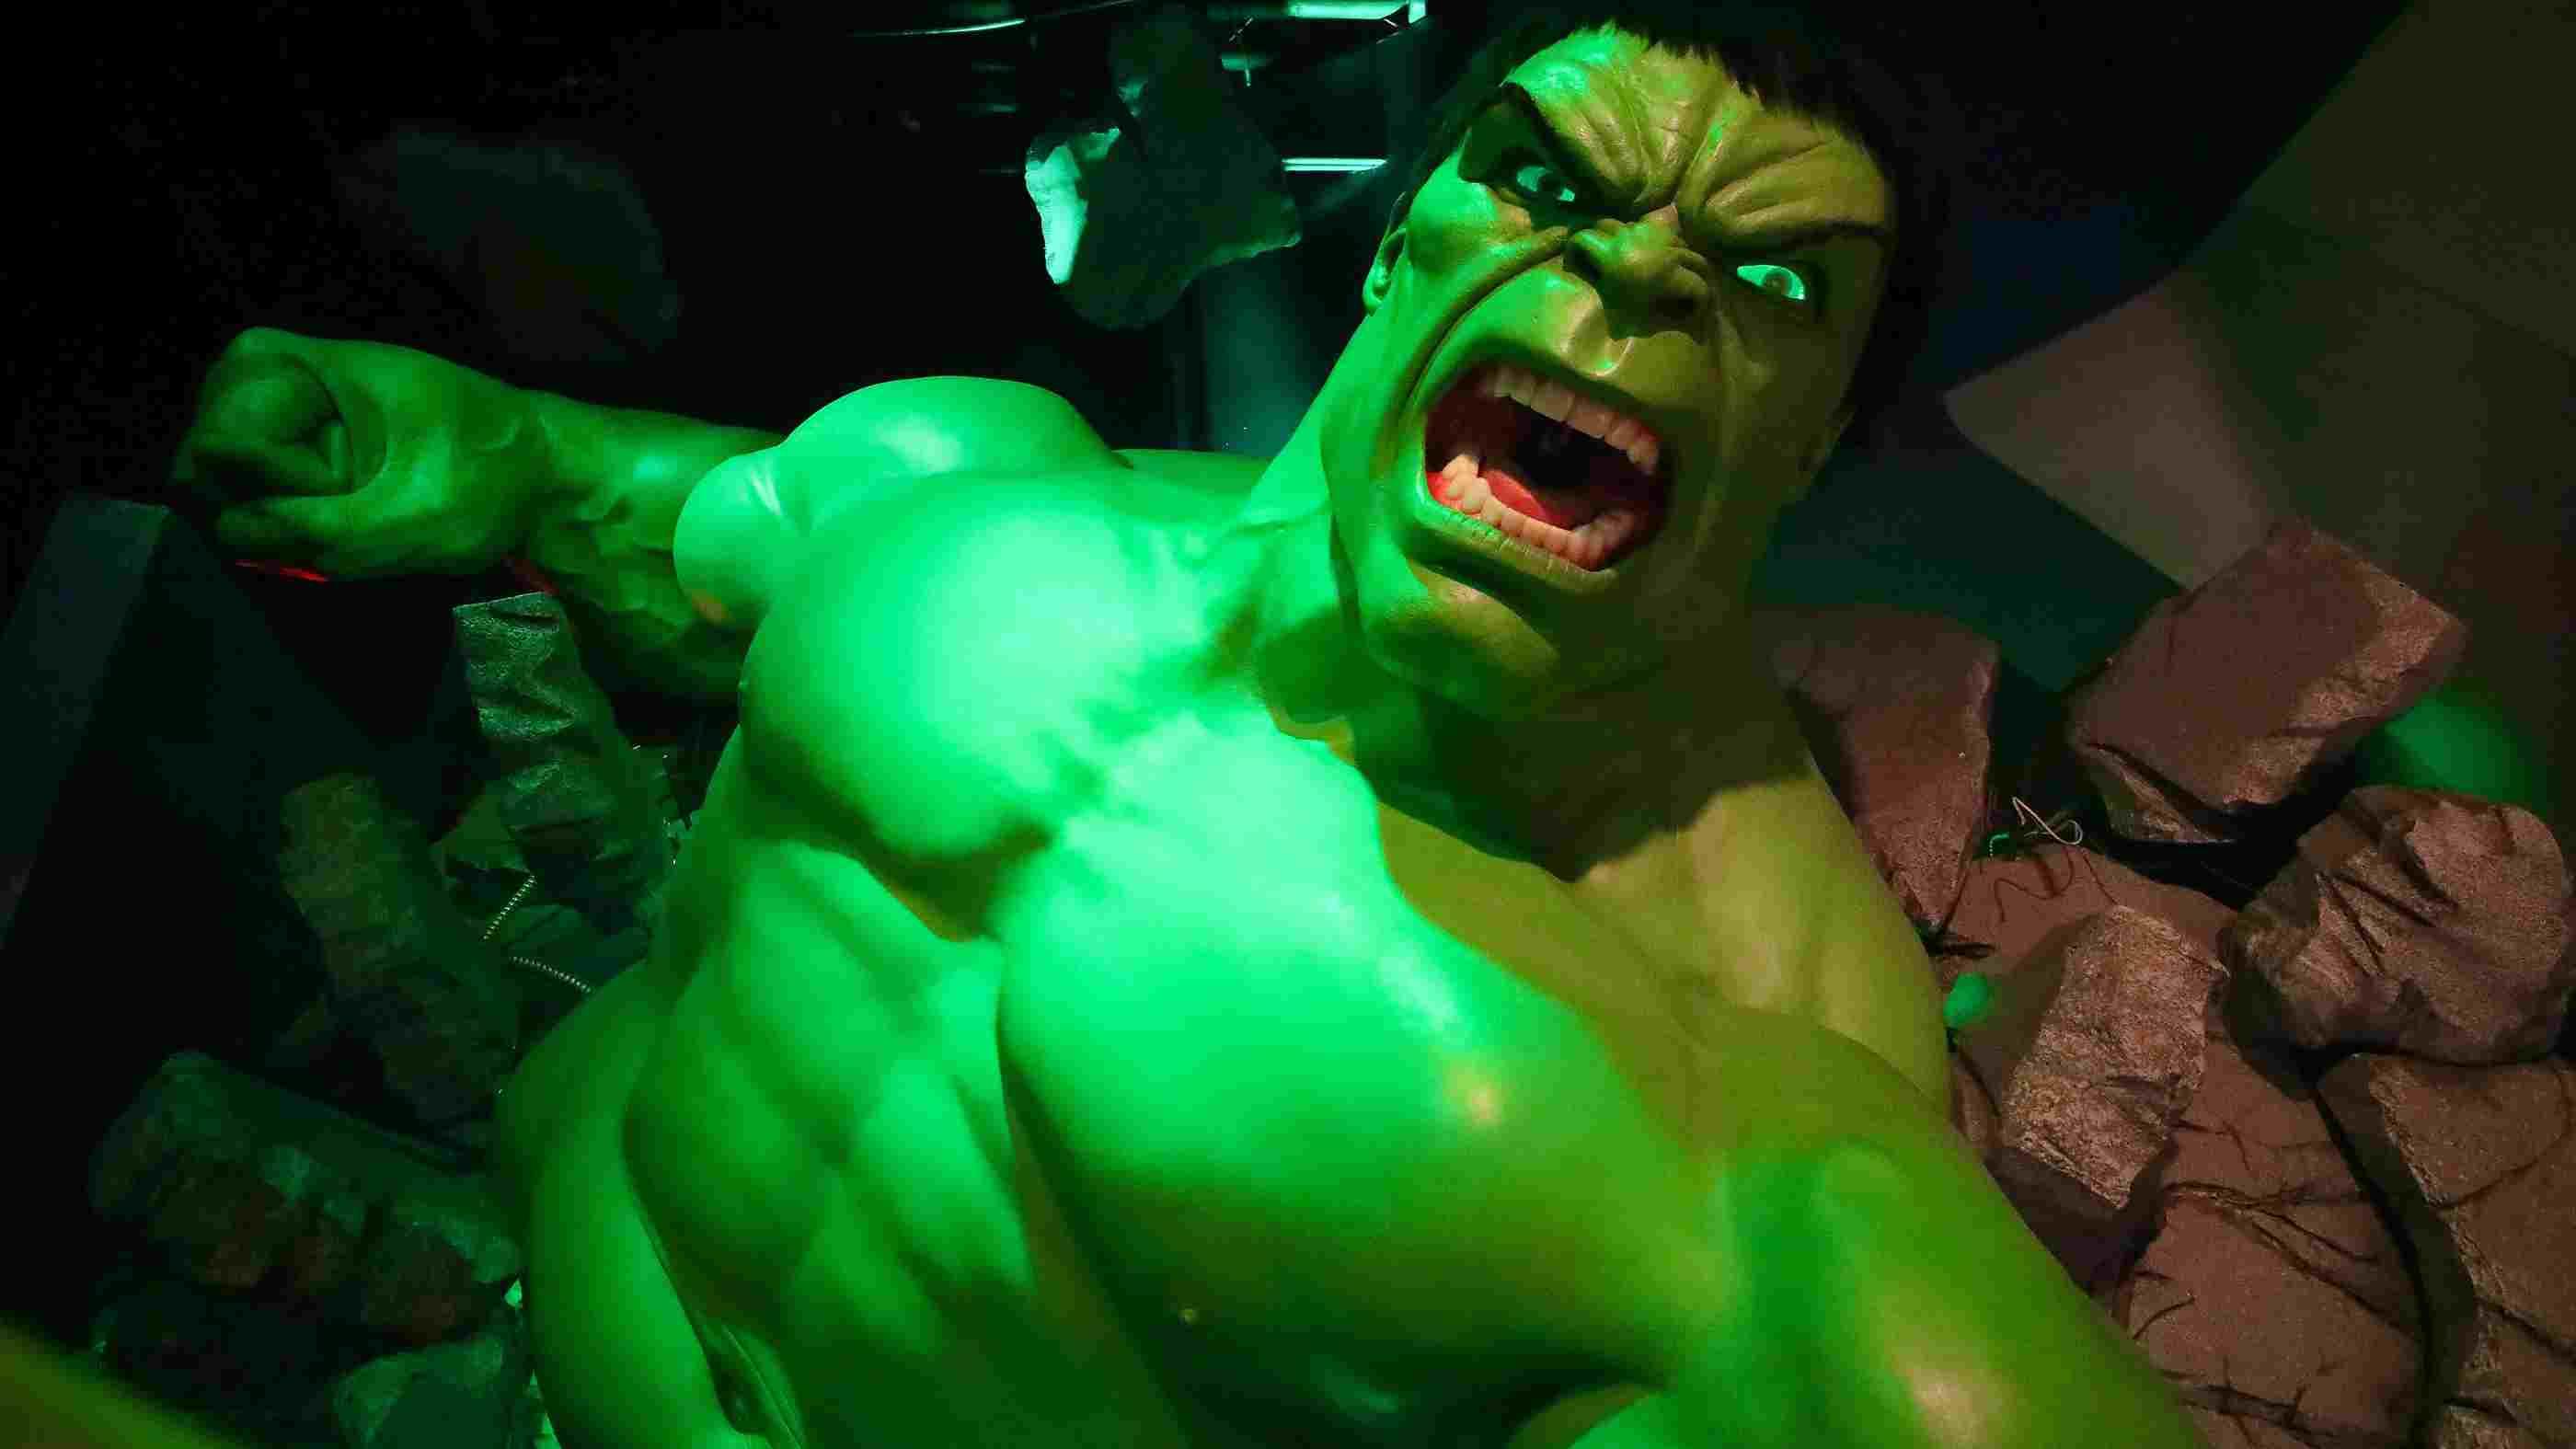 Hulk - Modèle géant - Madame Tussauds